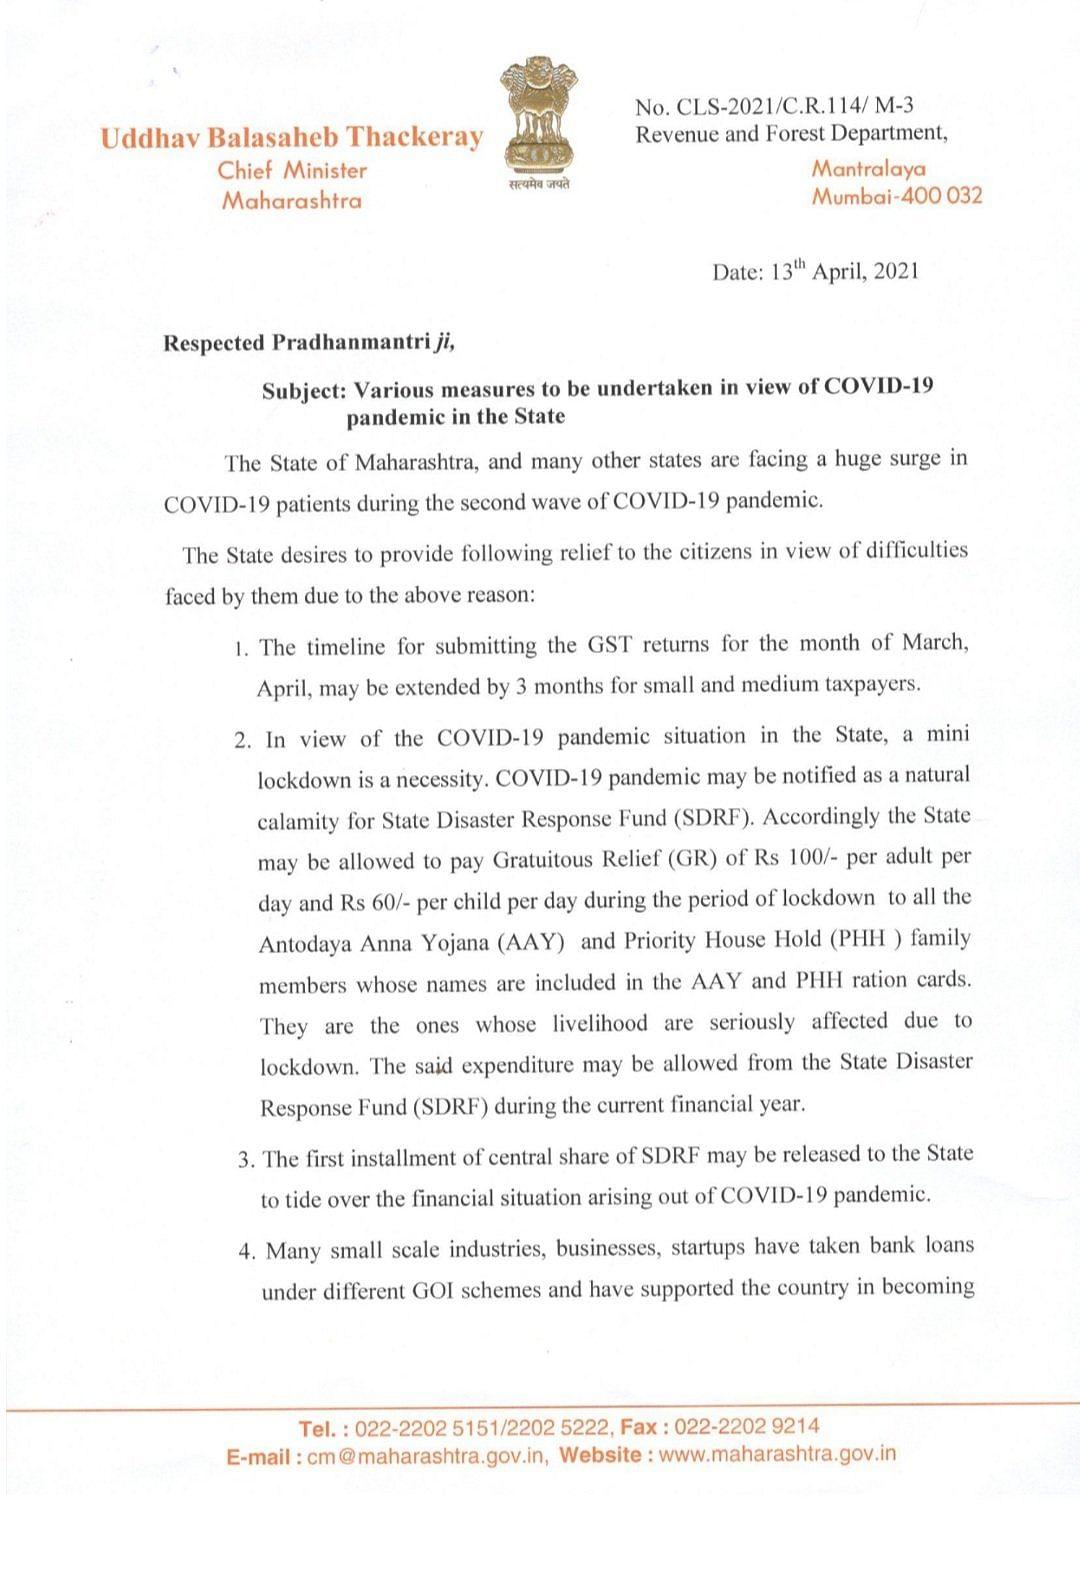 COVID-19: Maharashtra CM Uddhav Thackeray writes to PM Modi for medical oxygen, Remdesivir and necessary relief measures